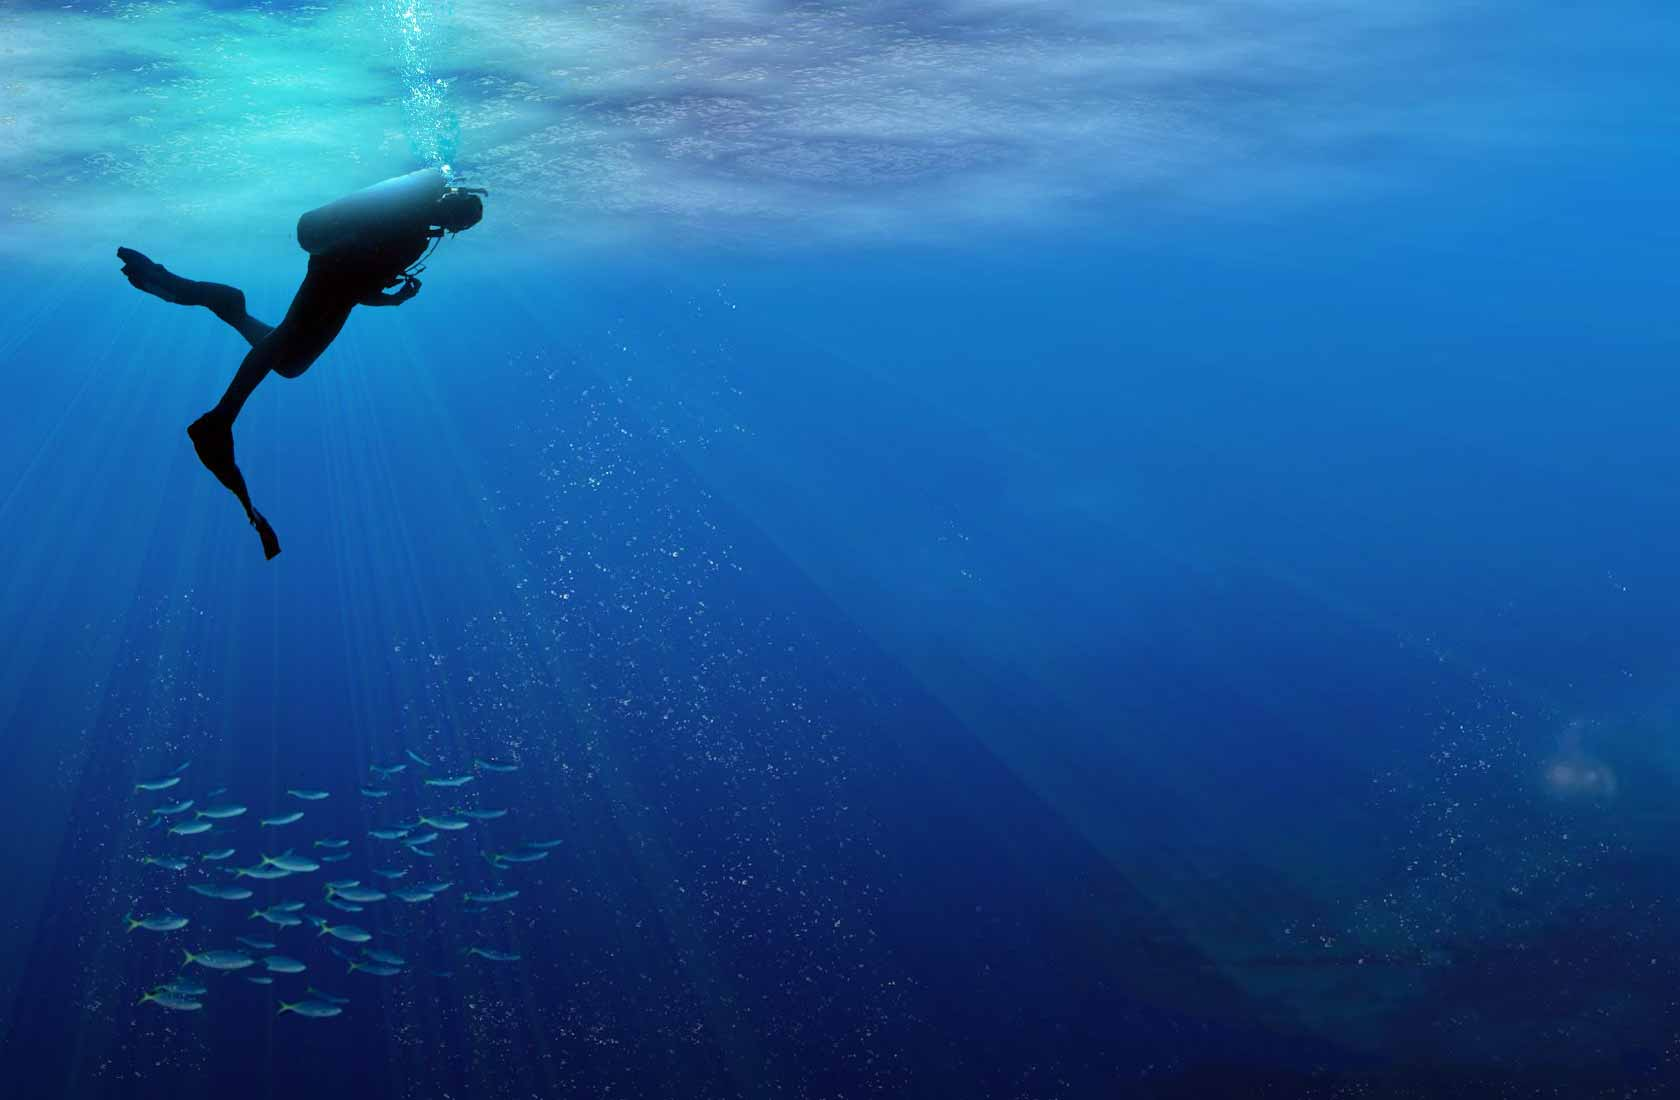 bkground_diver